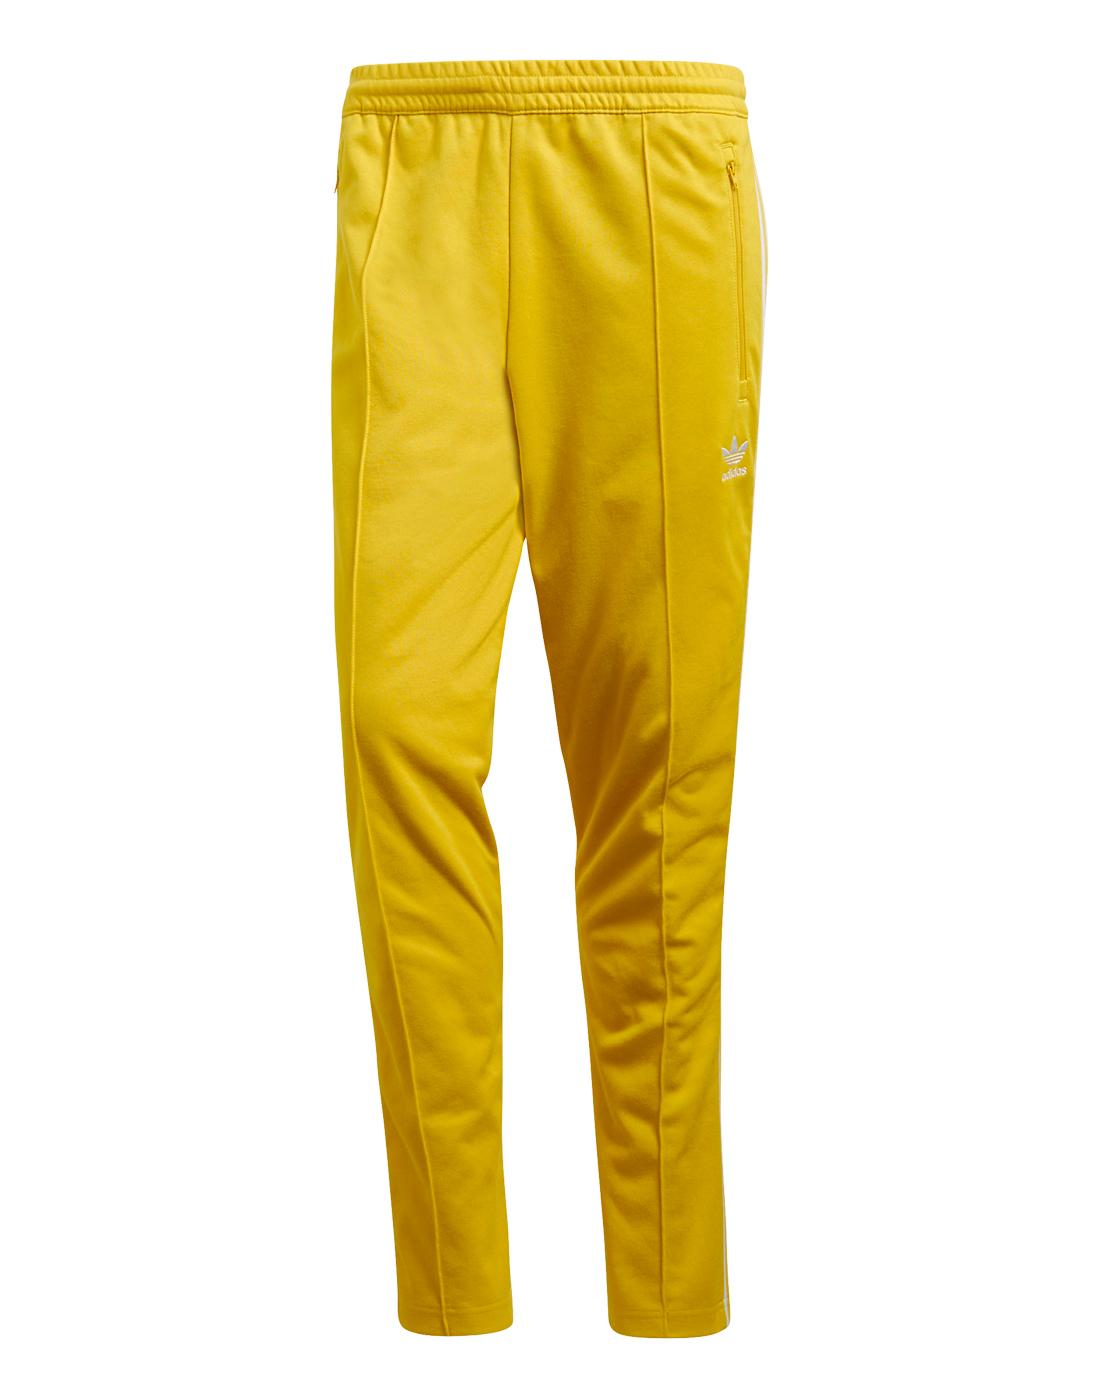 80cd56344518 Men s Yellow adidas Originals Beckenbauer Track Pants